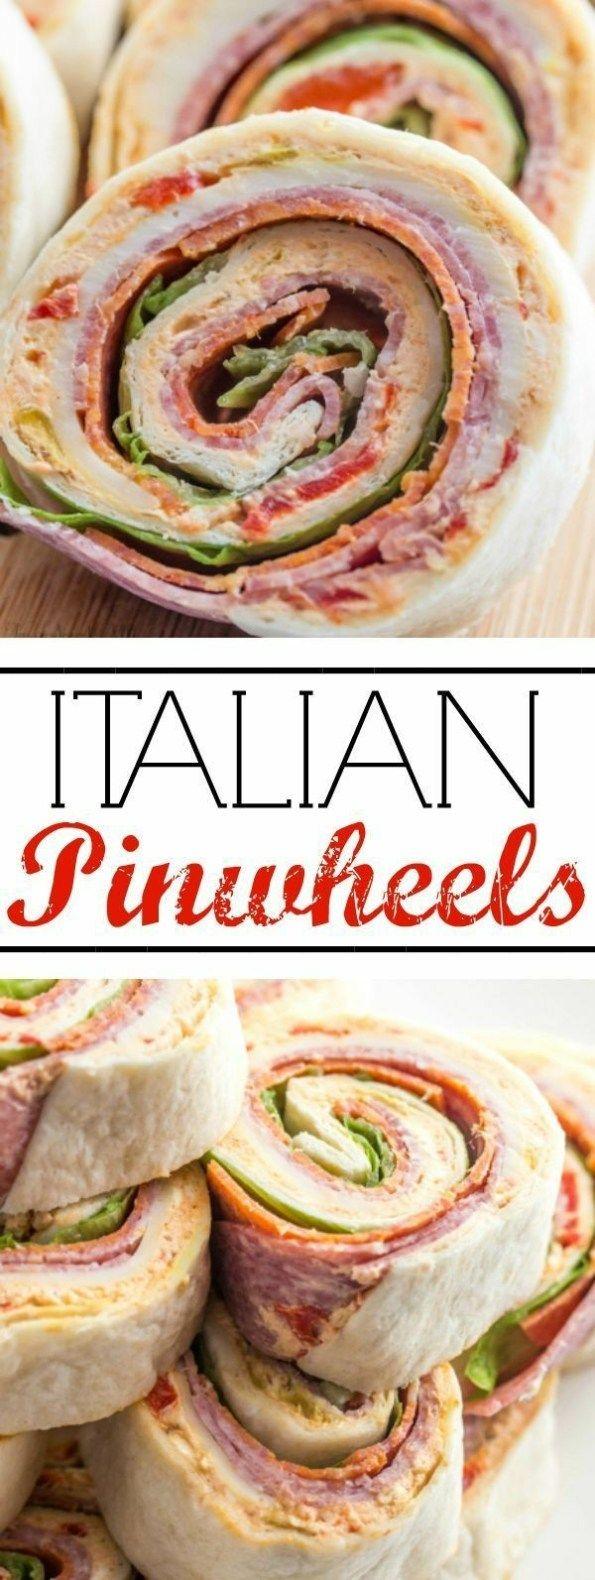 Italian Pinwheels - Tornadough Alli